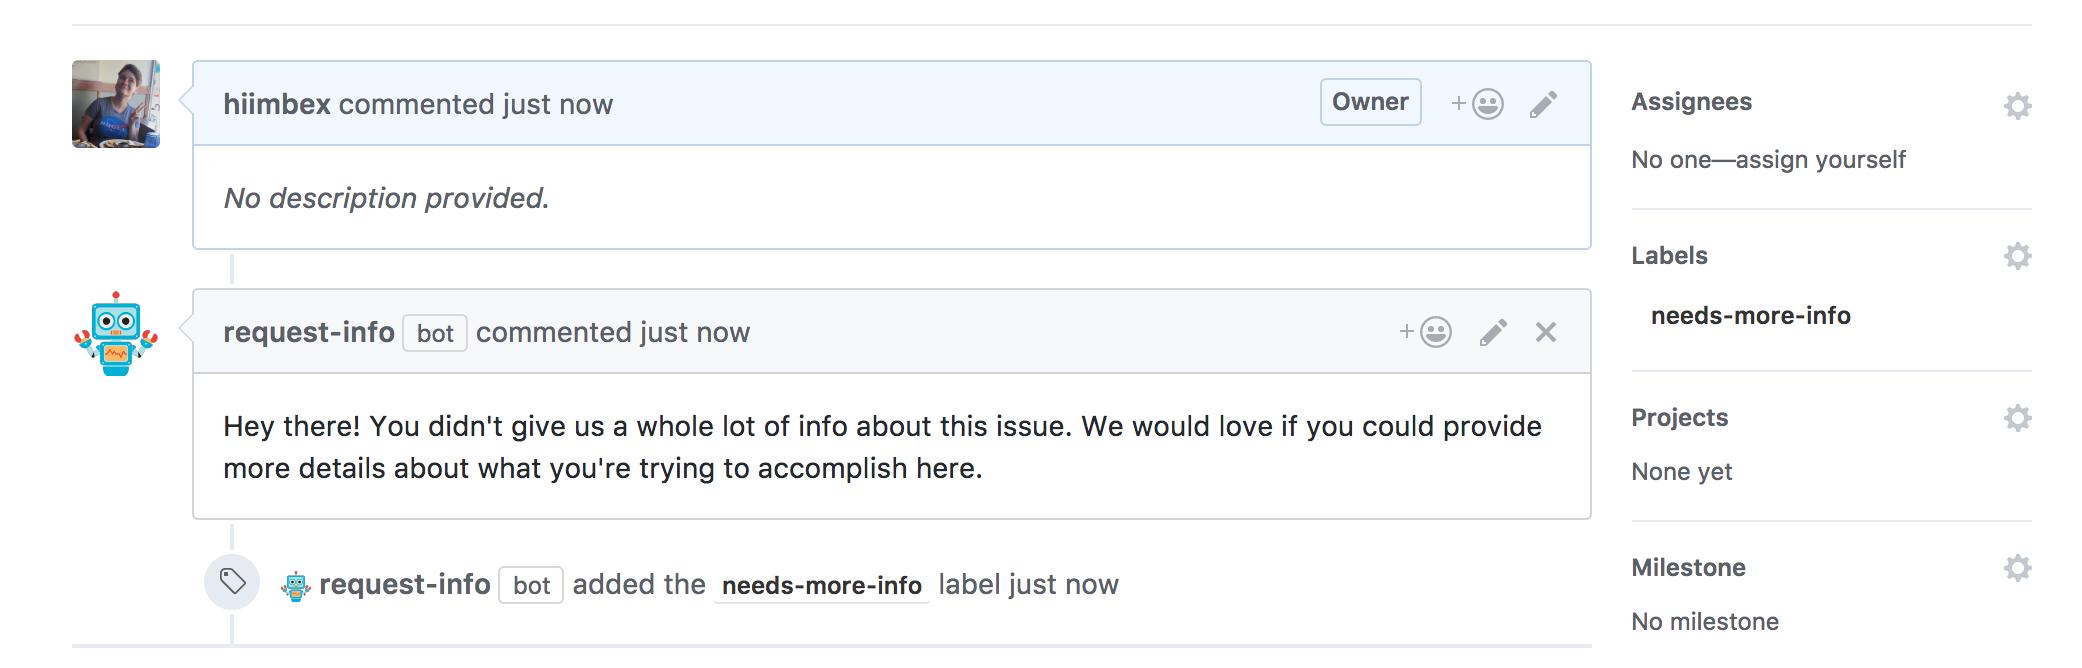 Request-Info bot